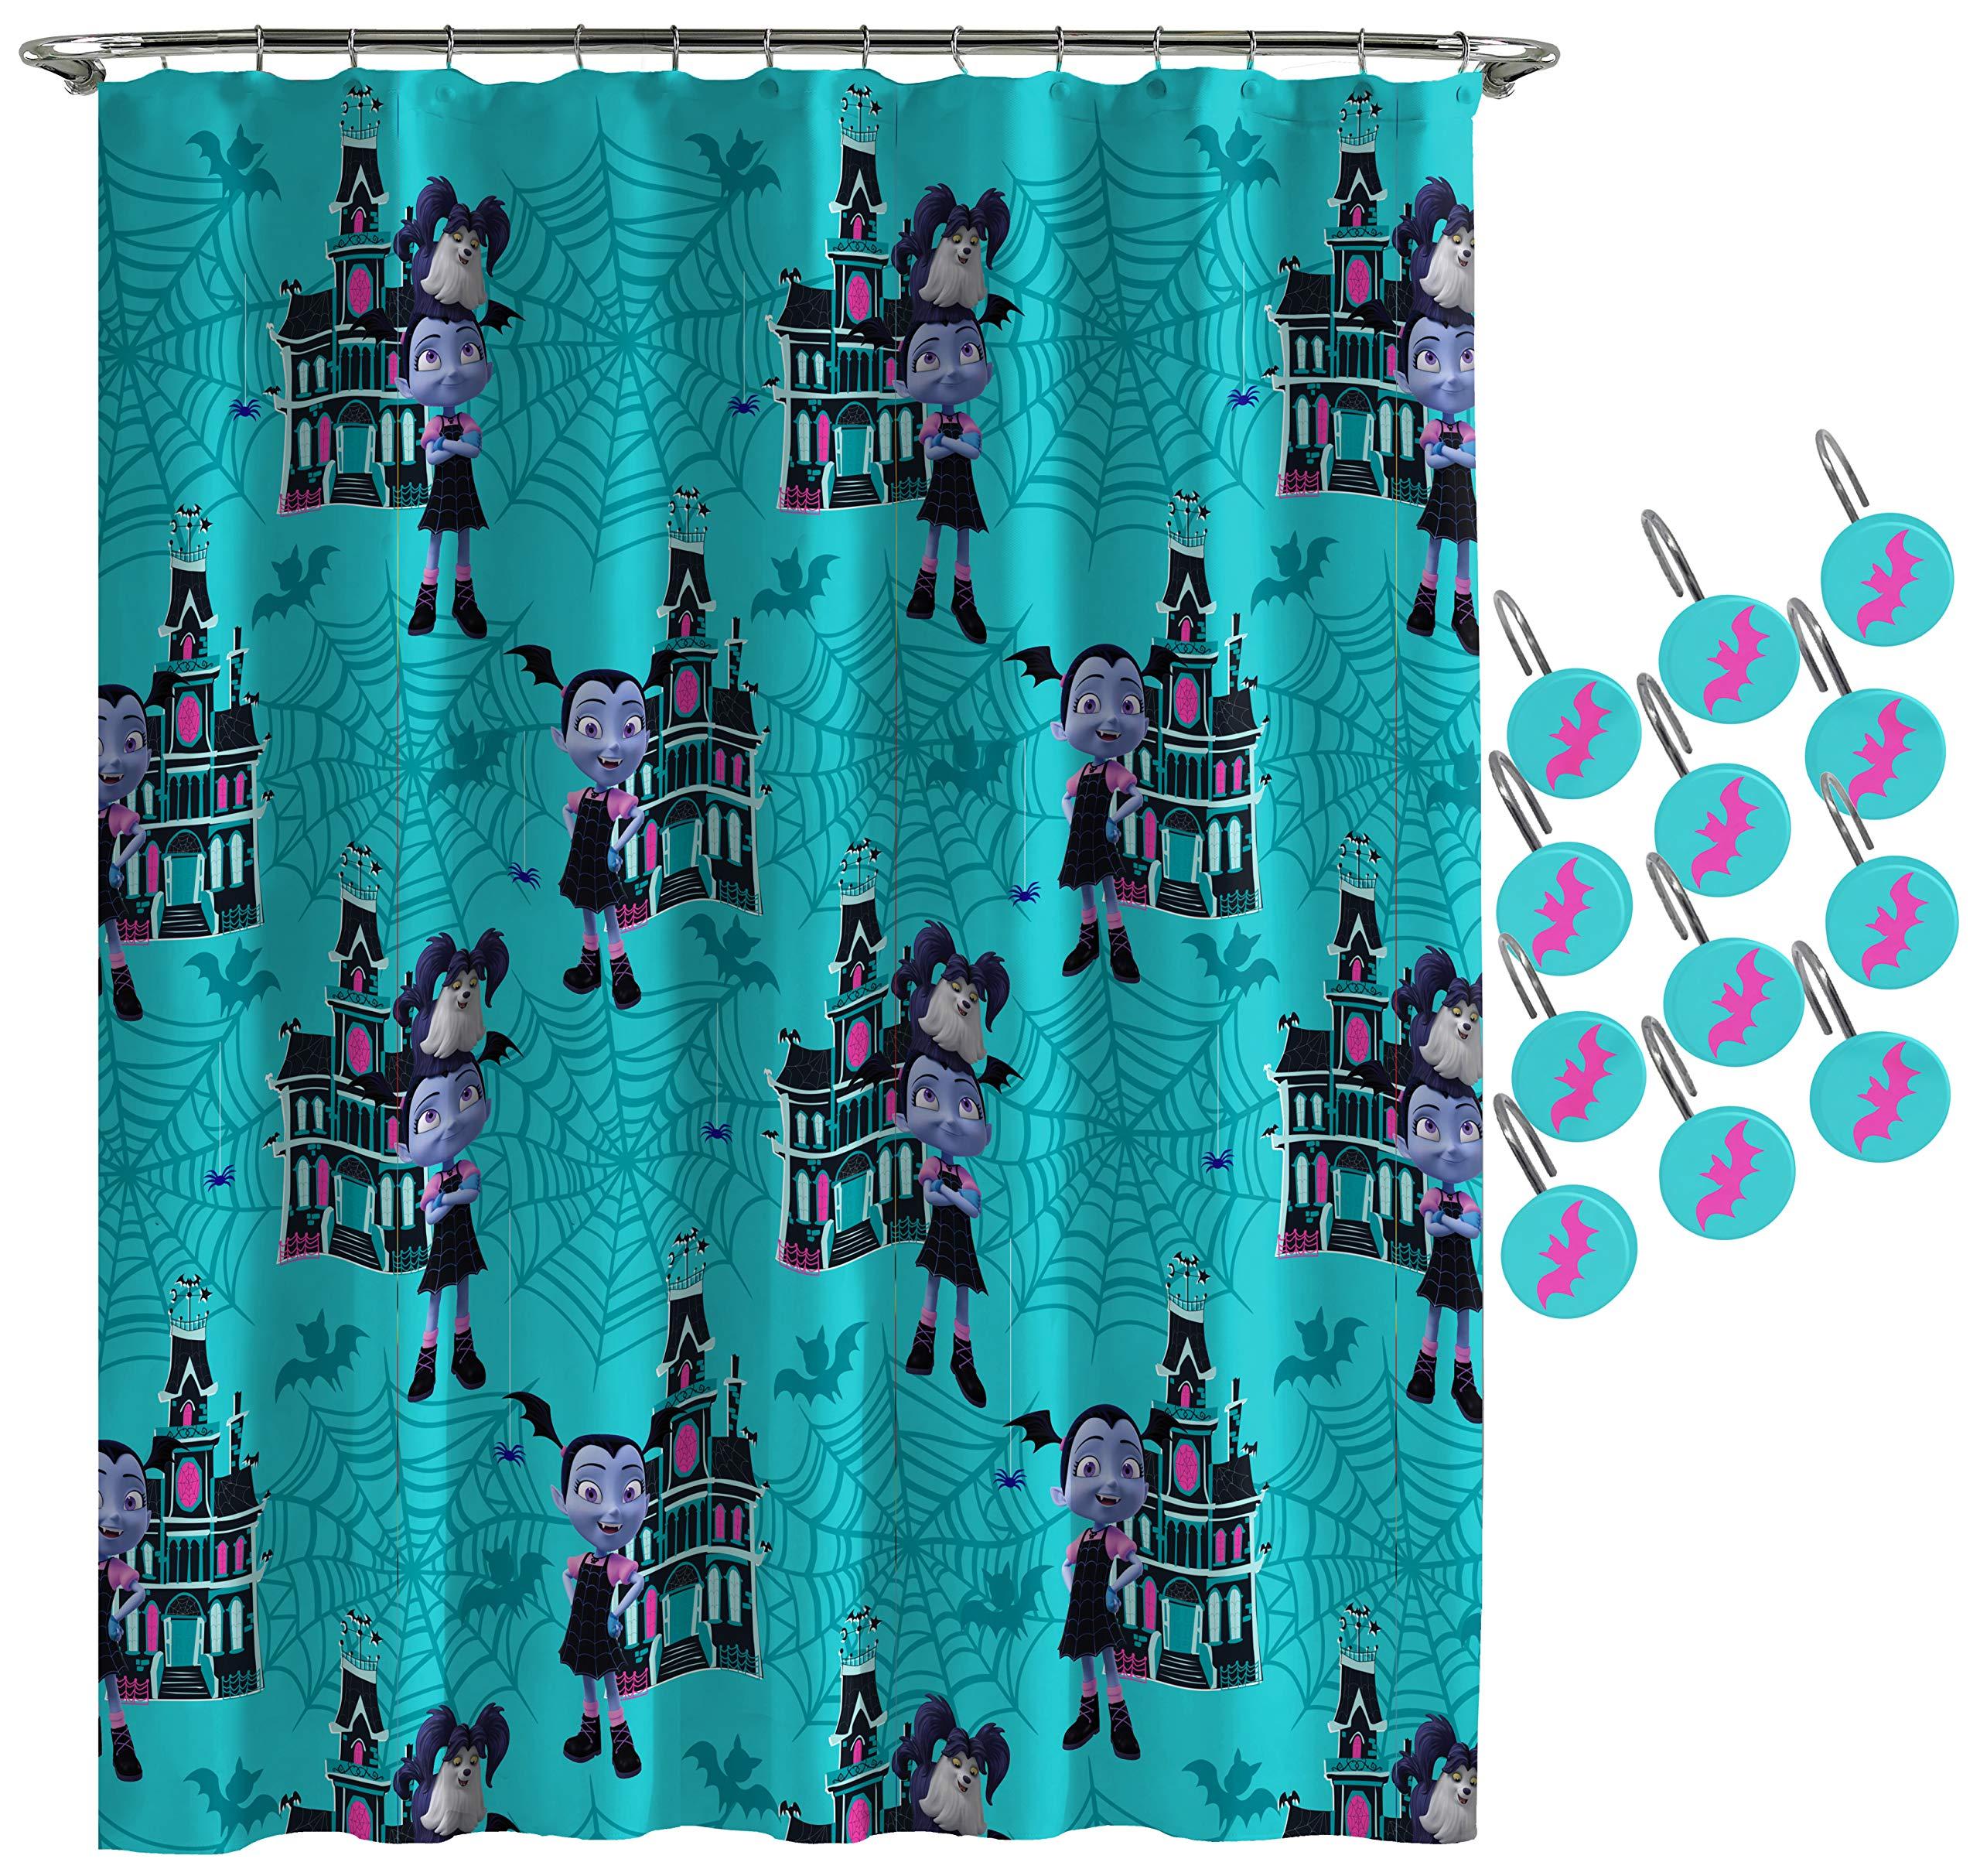 Jay Franco Disney Vampirina Shower Curtain & 12-Piece Hook Set & Easy Use - Kids Bath Features Vampirina Hauntley (Official Disney Product) by Jay Franco (Image #1)